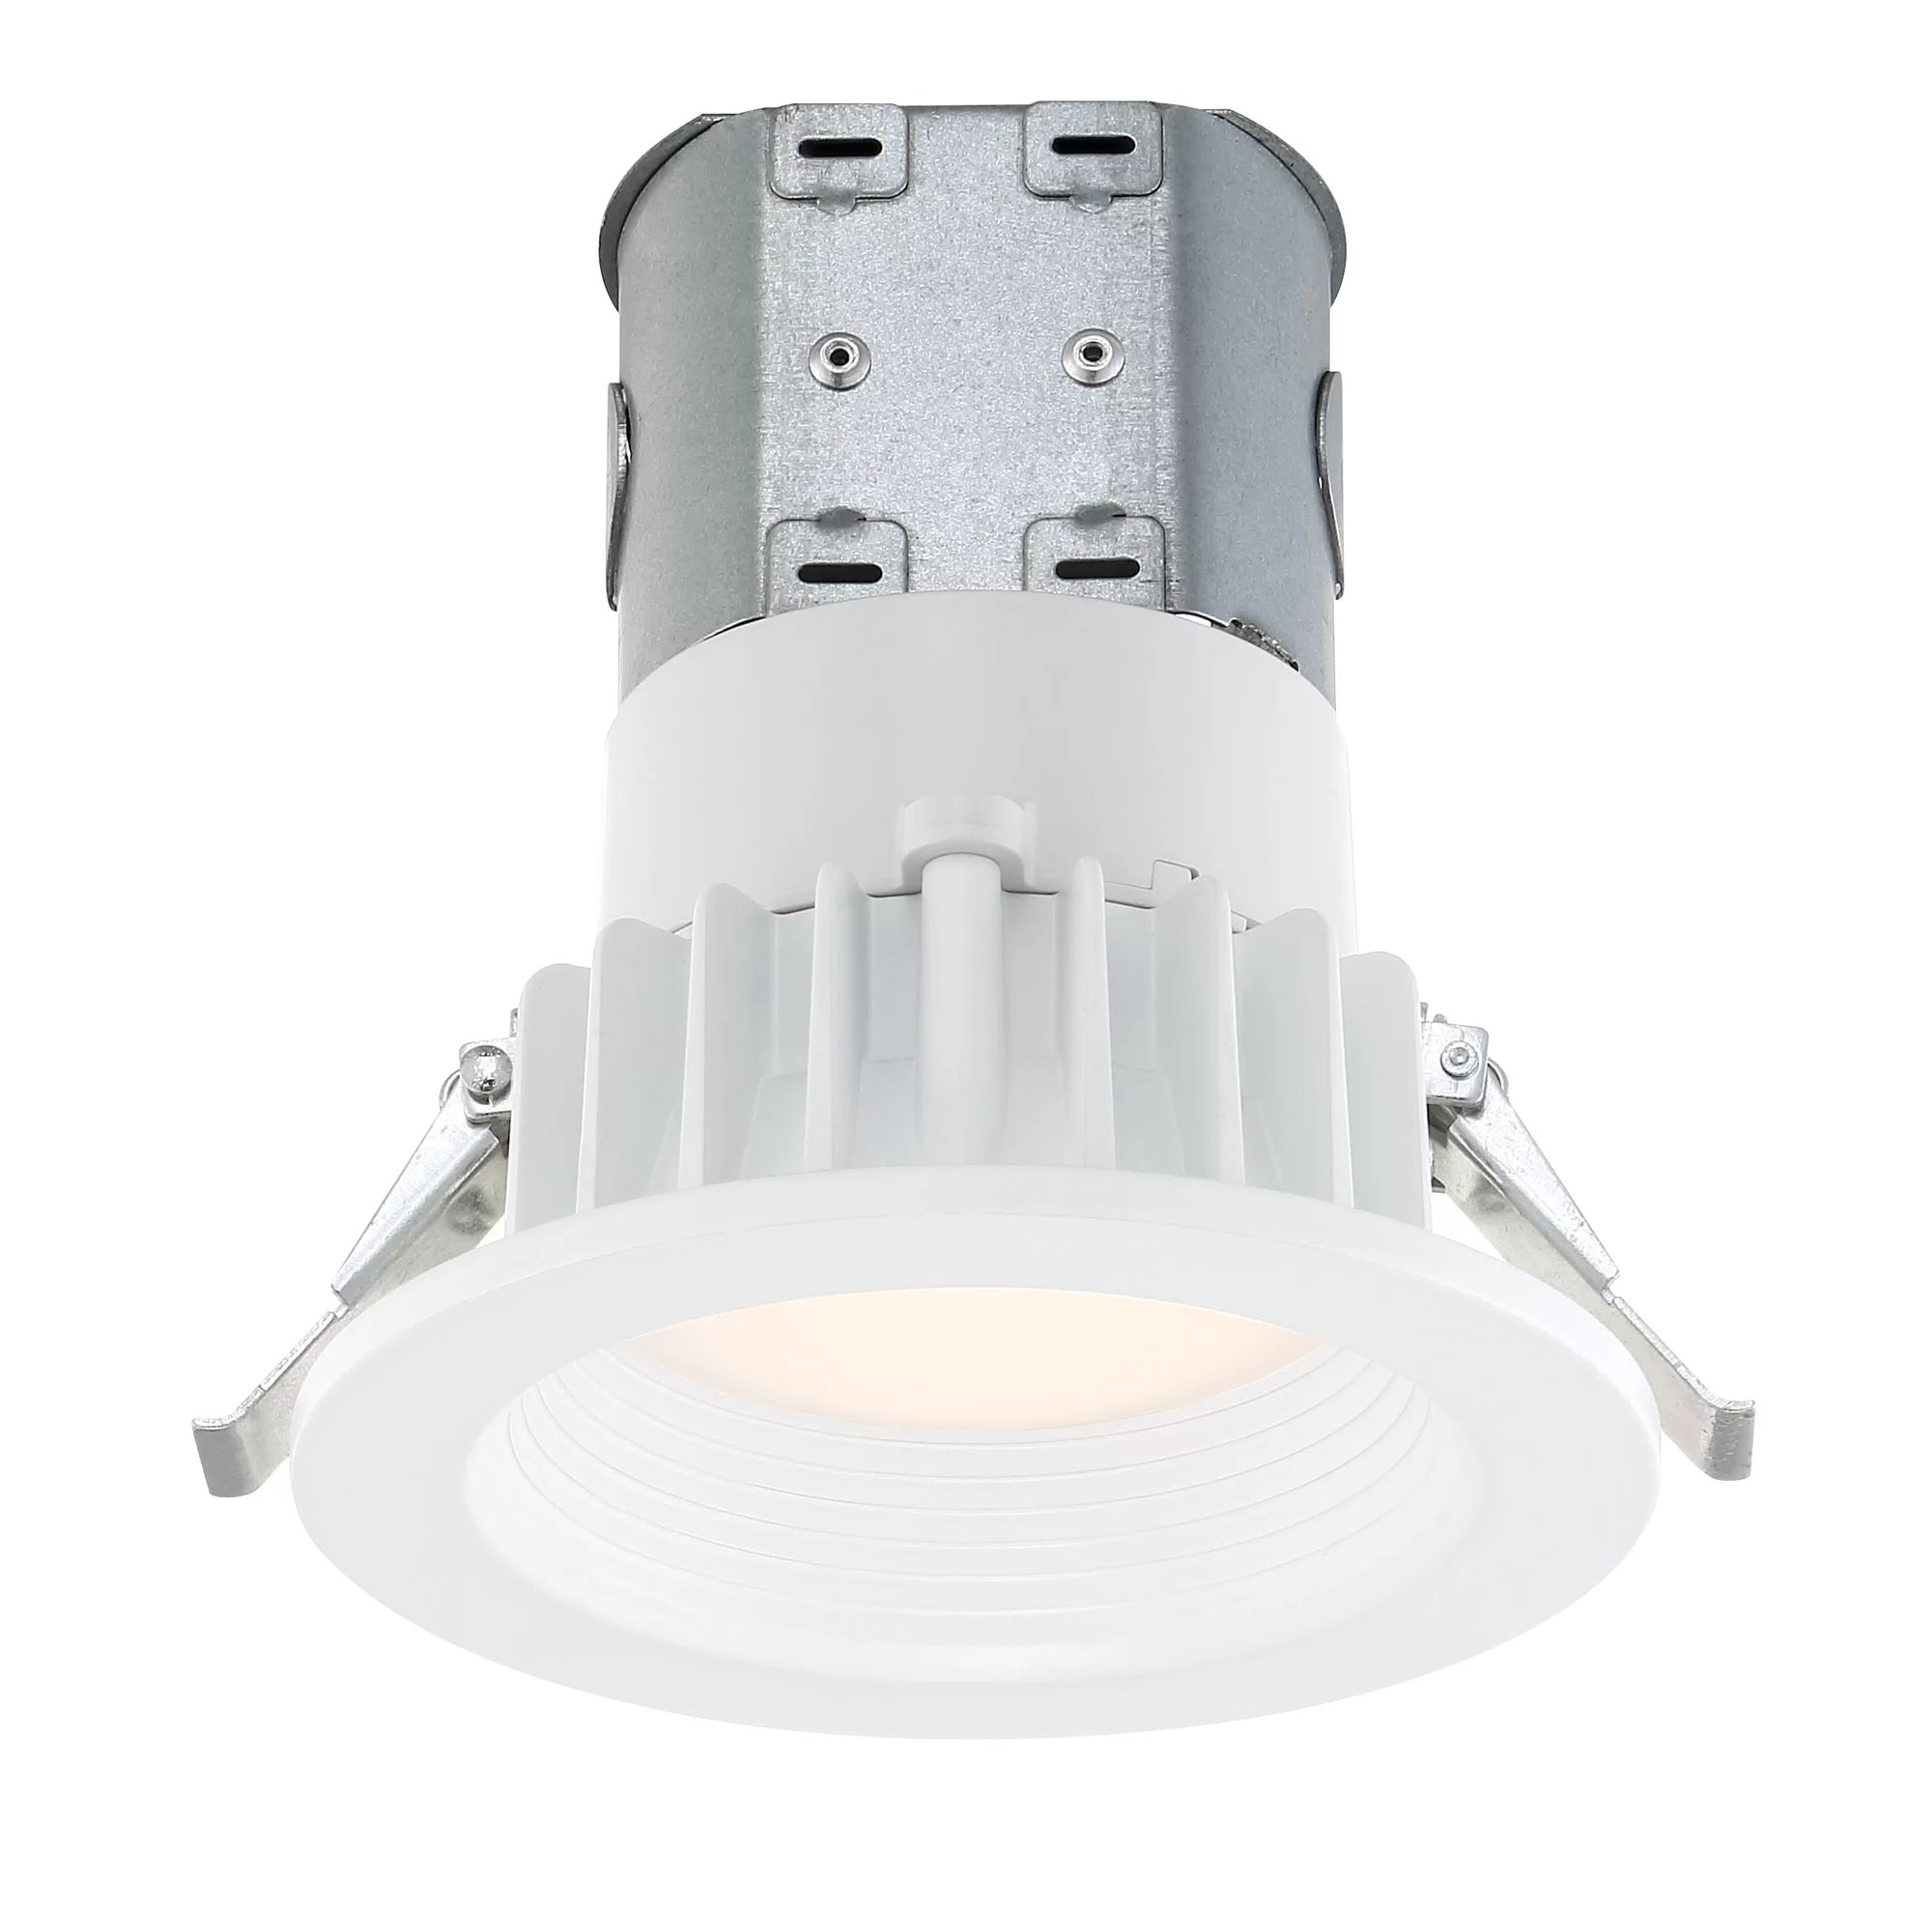 dixson easy up 4 led recessed lighting kit